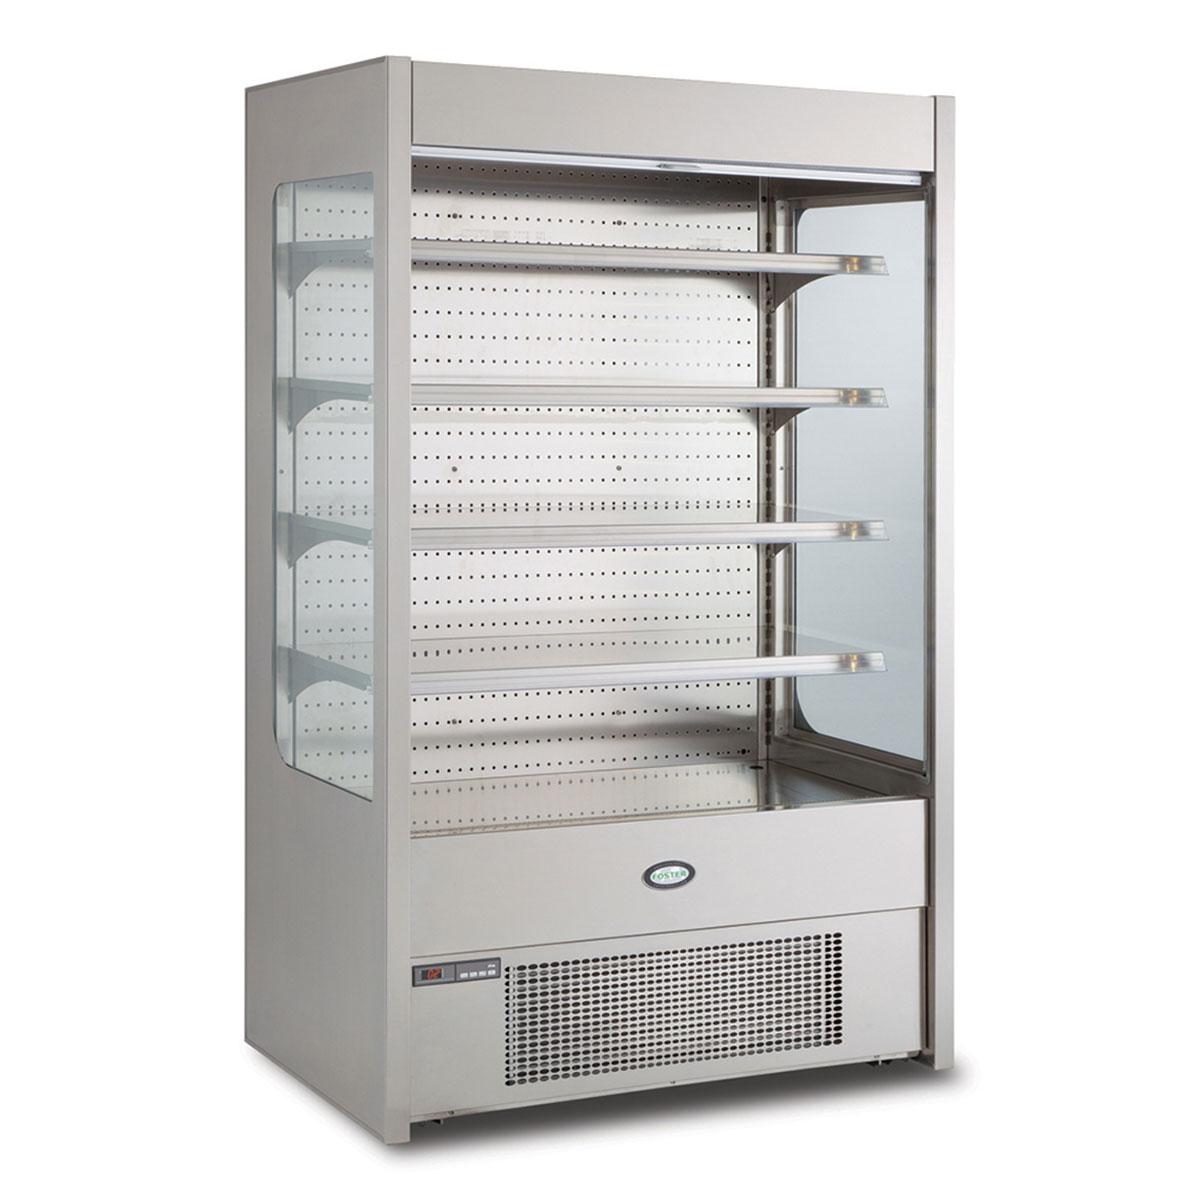 Foster Pro Multidecks 1 - Refrigeration Equipment Suppliers in Cornwall